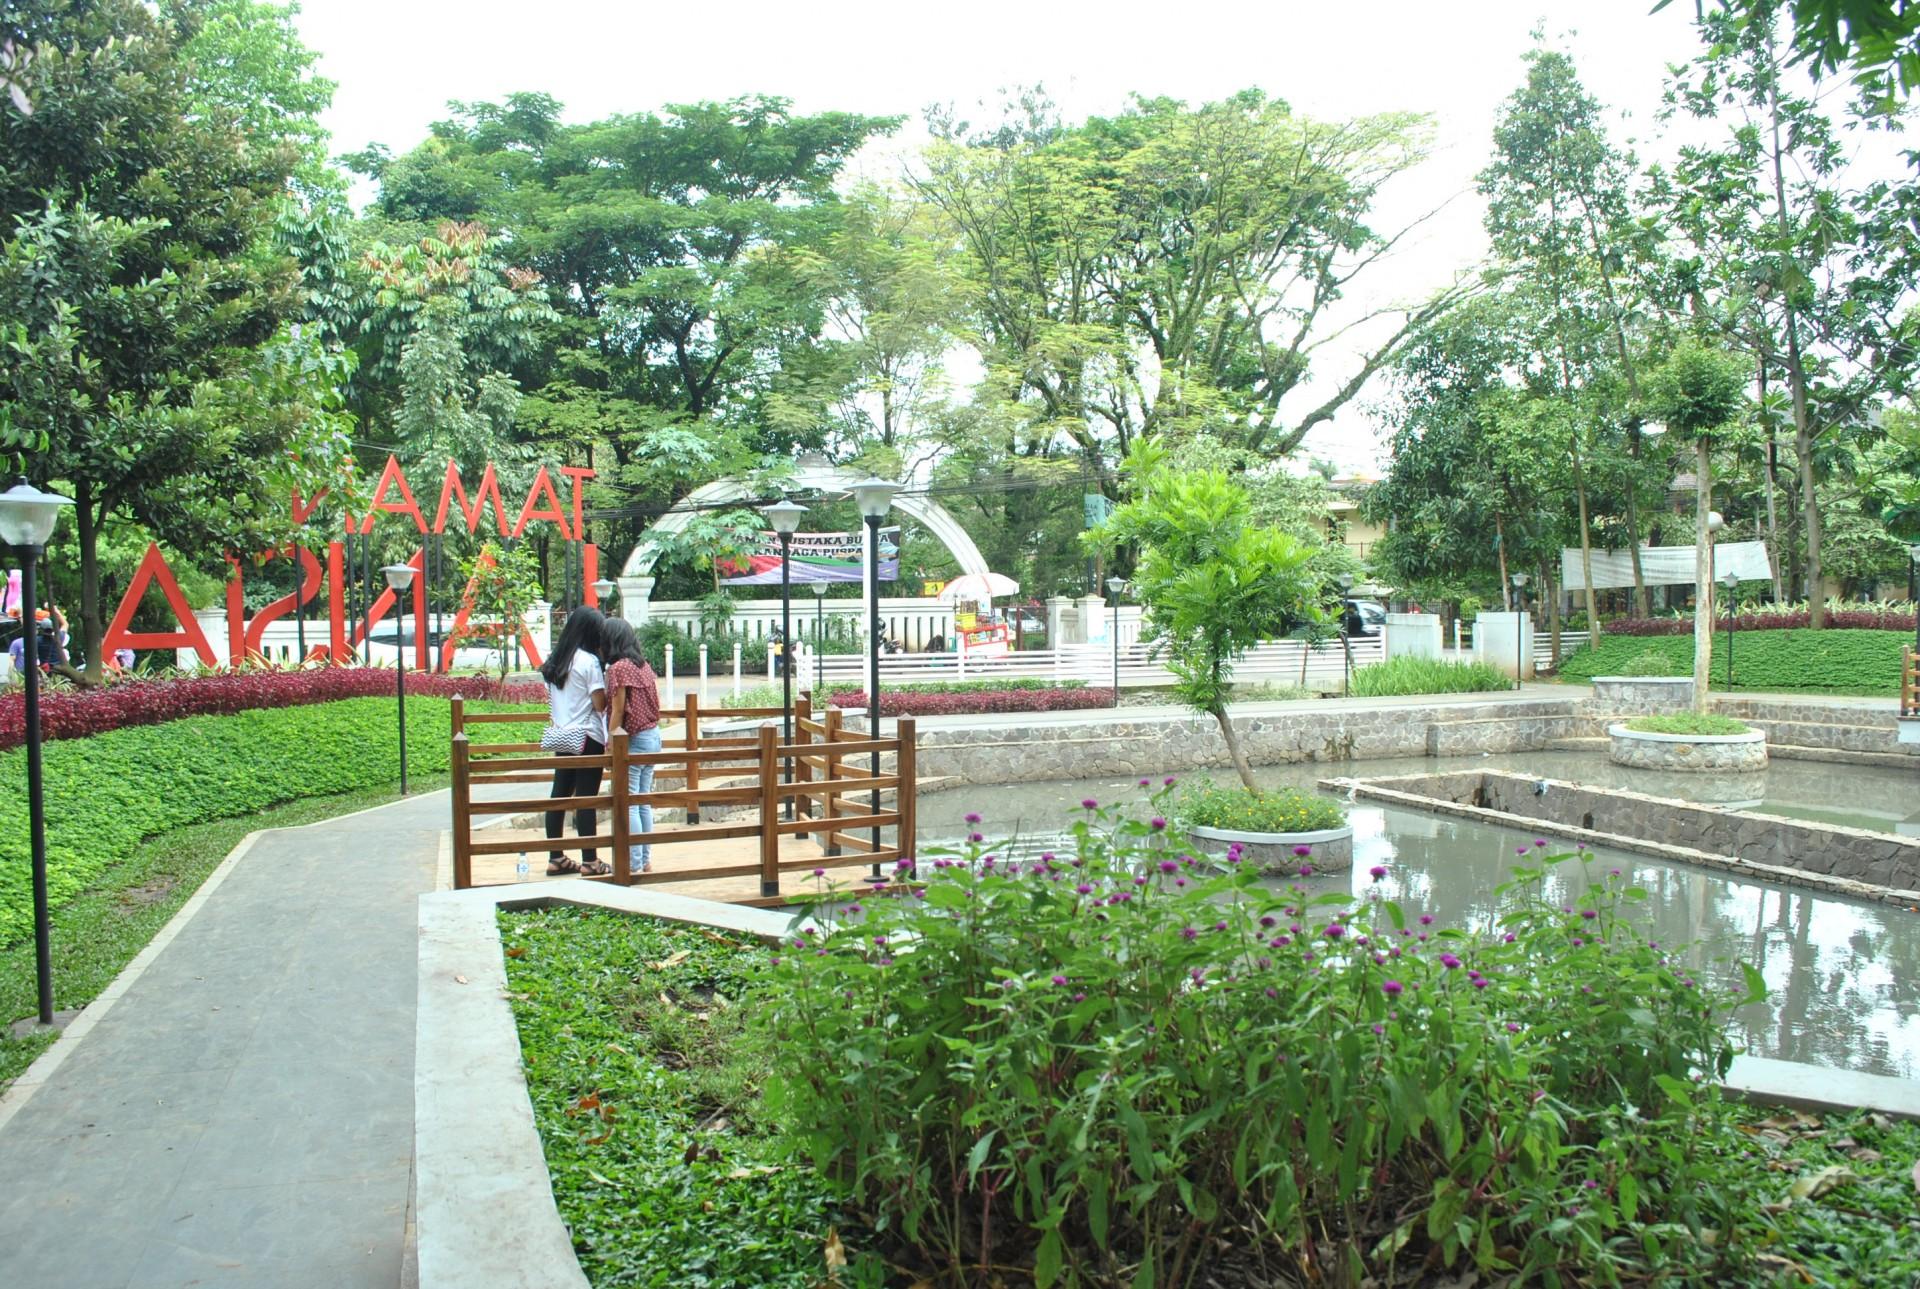 Tempat Nongkrong Murah Bandung Bayar Parkir Doang Taman Lansia 10